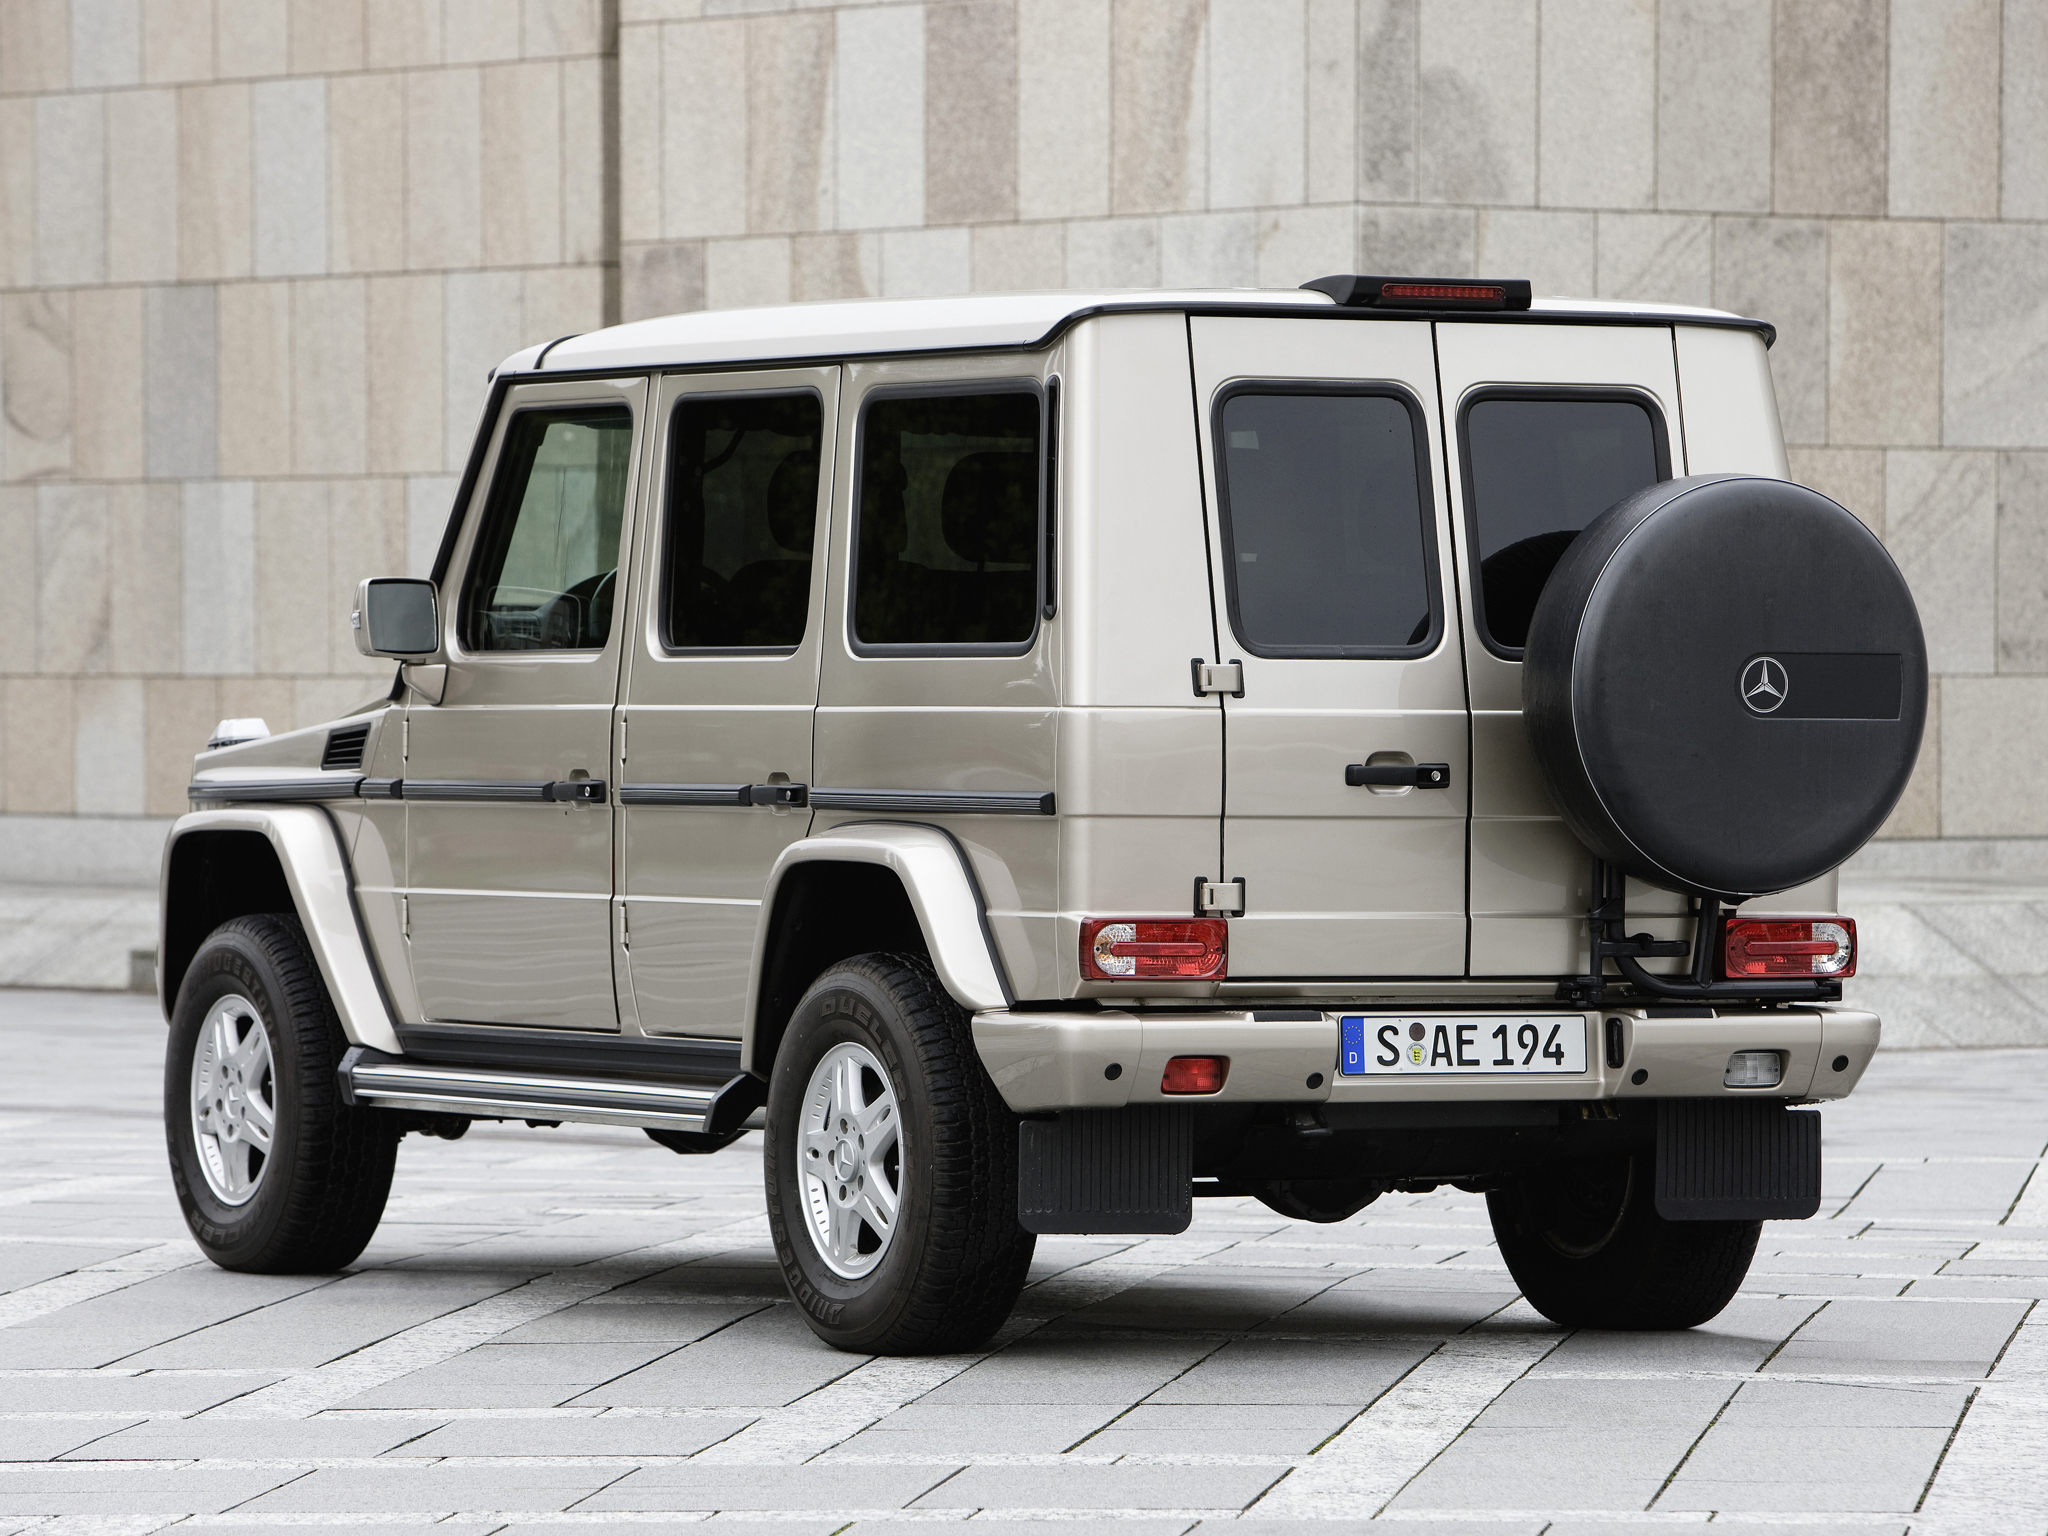 2009 Armored Mercedes Benz G 500 Guard W463 Suv 4x4 Wallpaper 2048x1536 130323 Wallpaperup